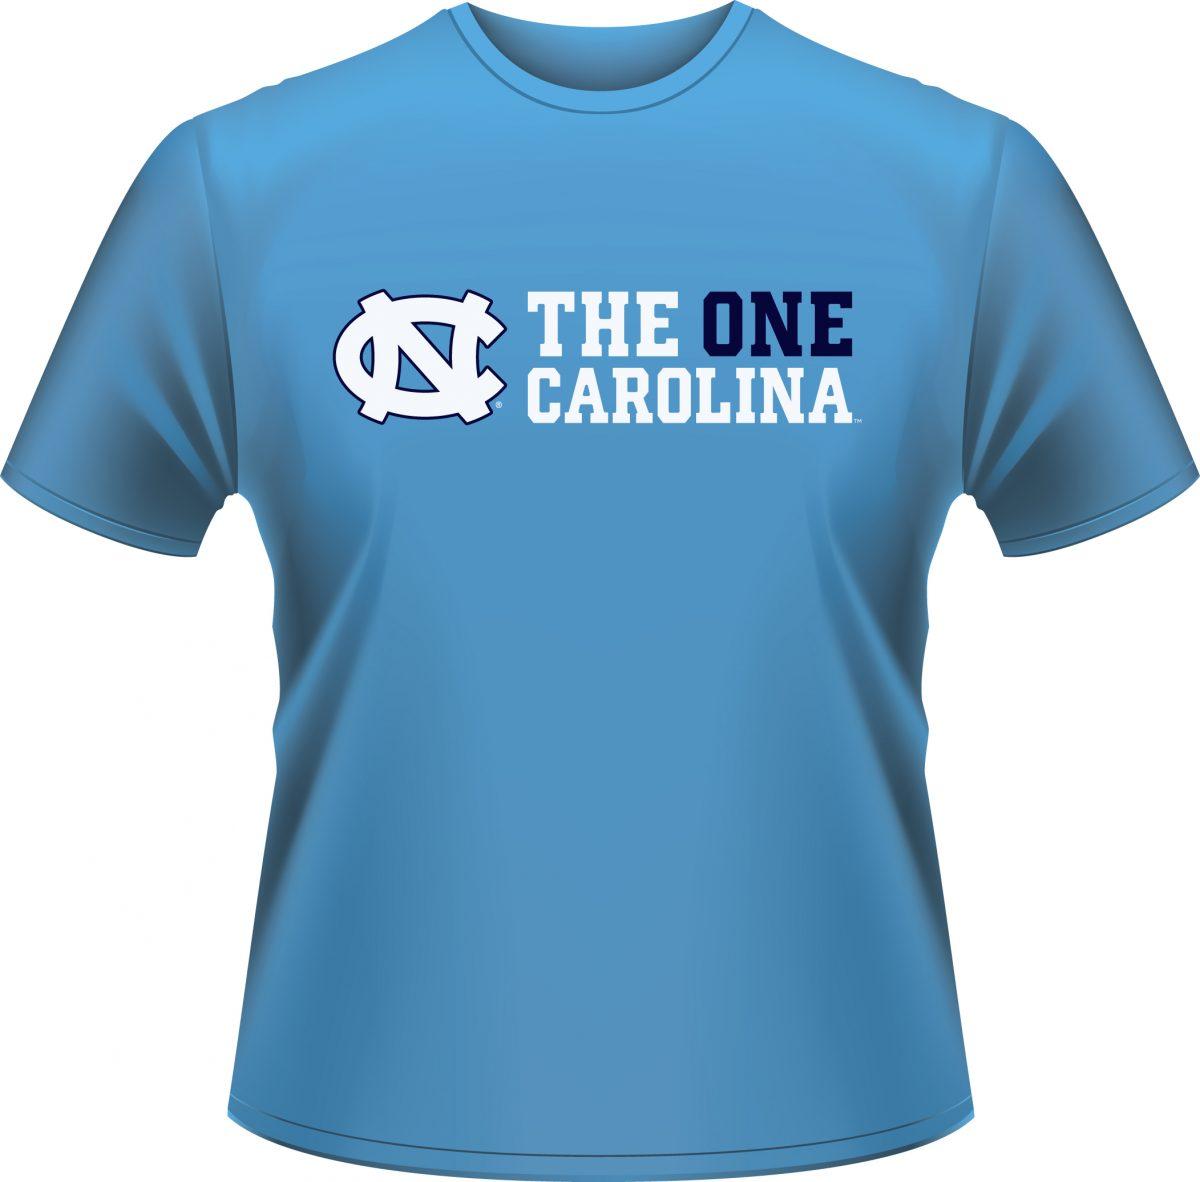 The One Carolina Tailgate & UNC v USC Game (Aug 31)